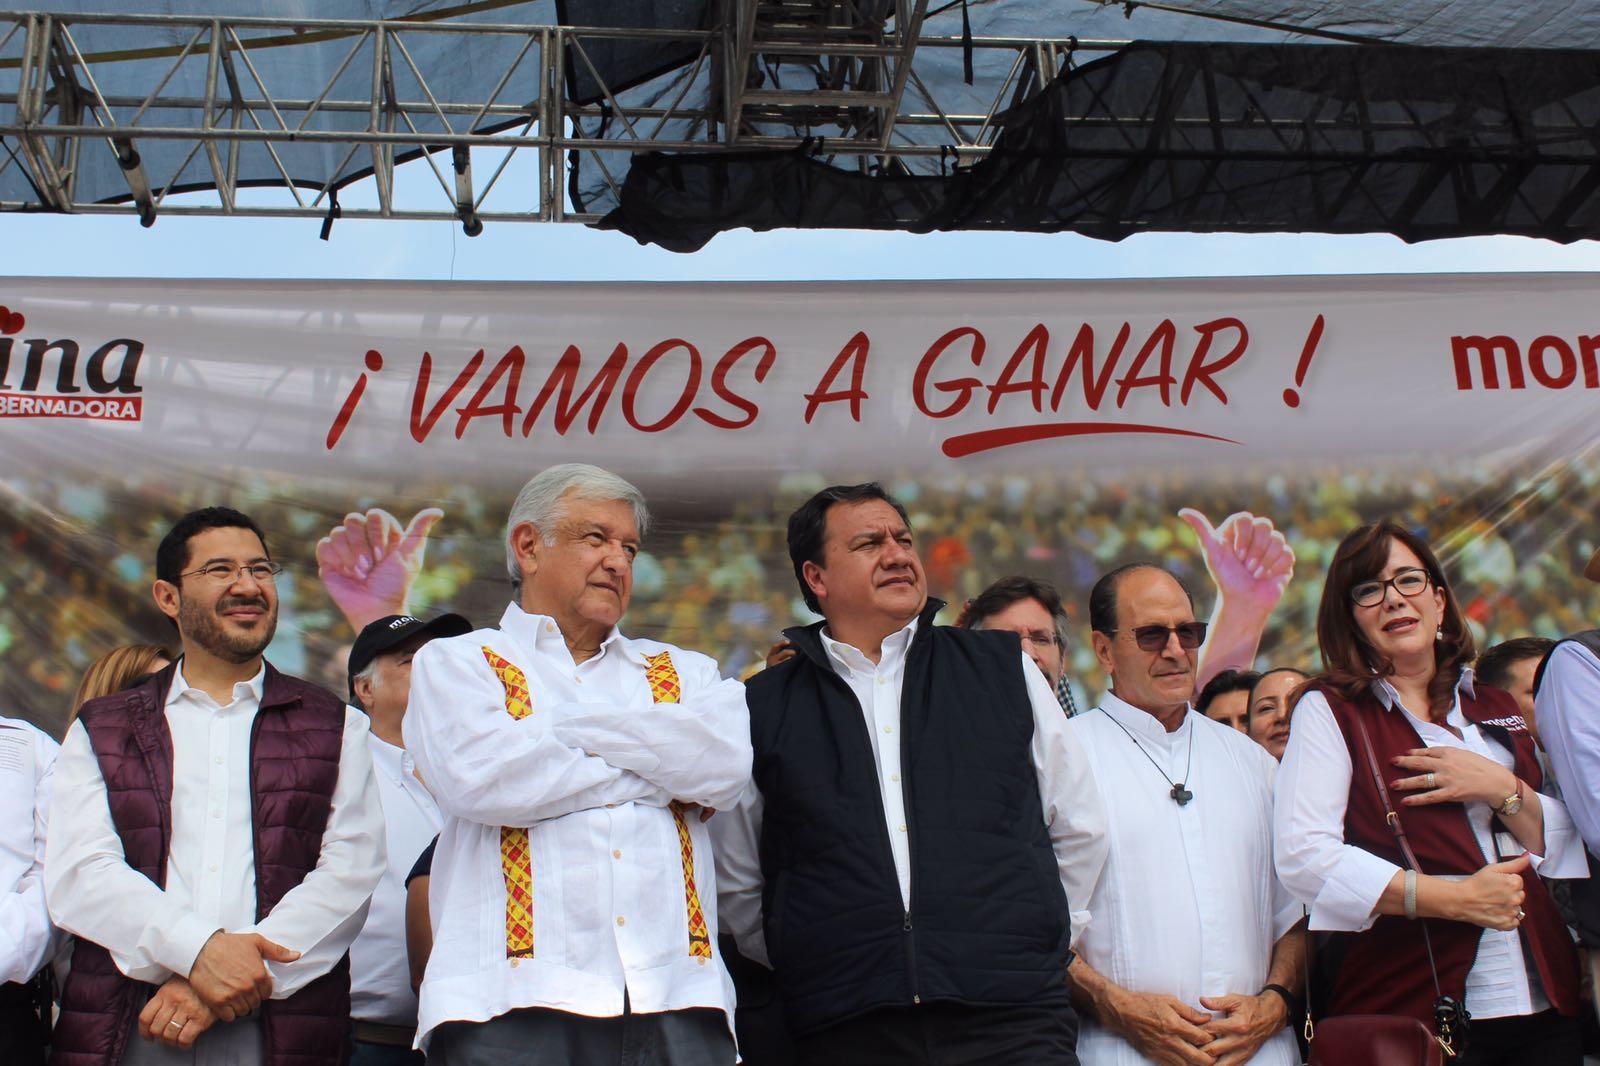 Óscar González del PT declina a favor de Delfina — Que siempre sí